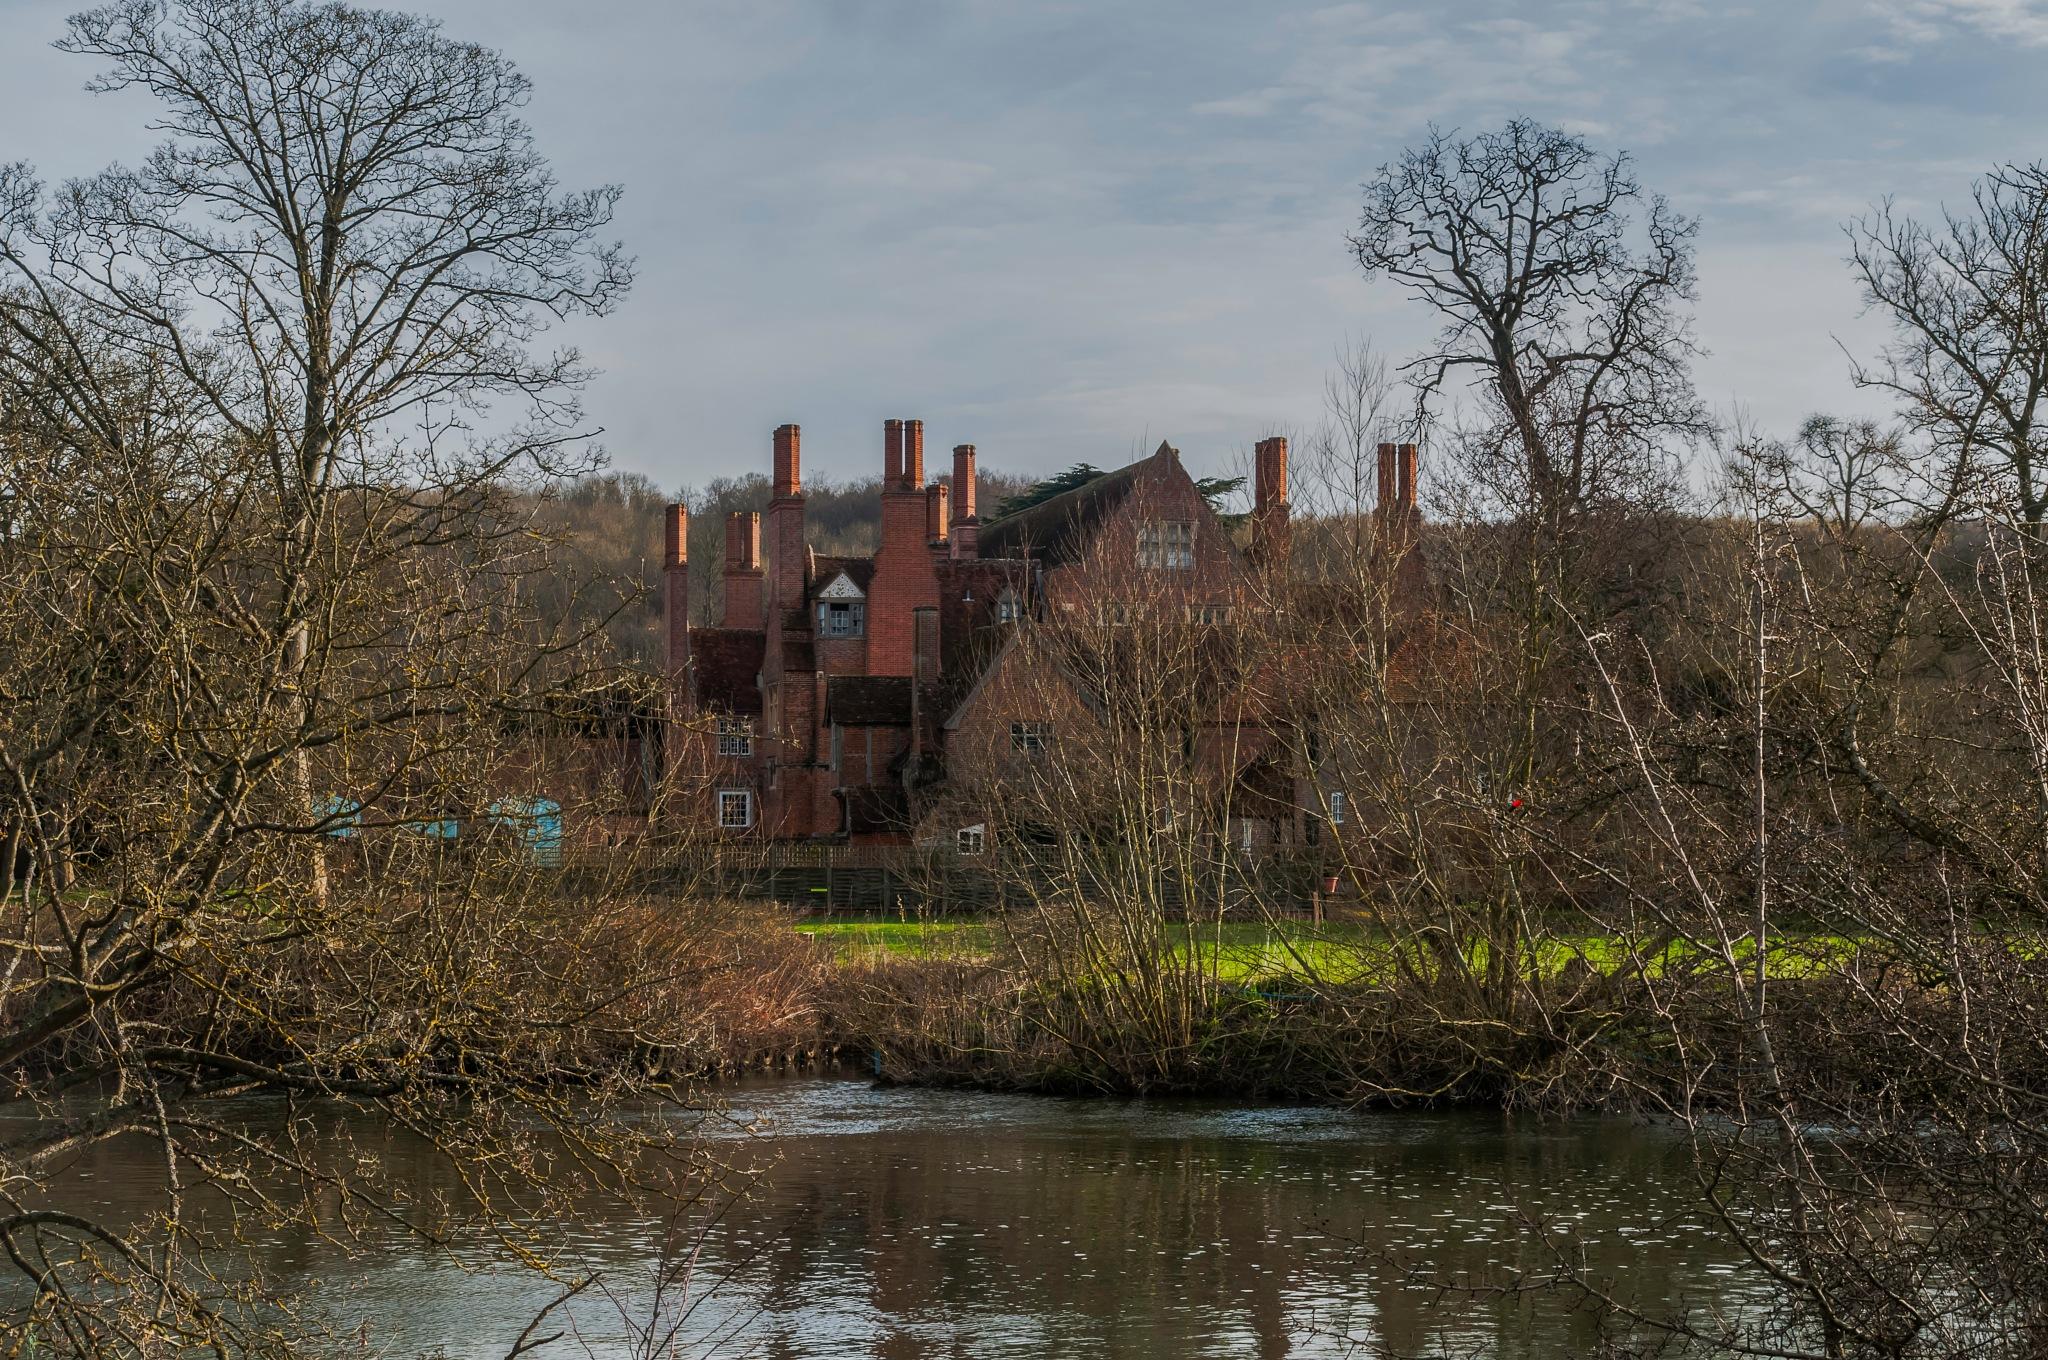 Mapledurham house by Jim Hellier